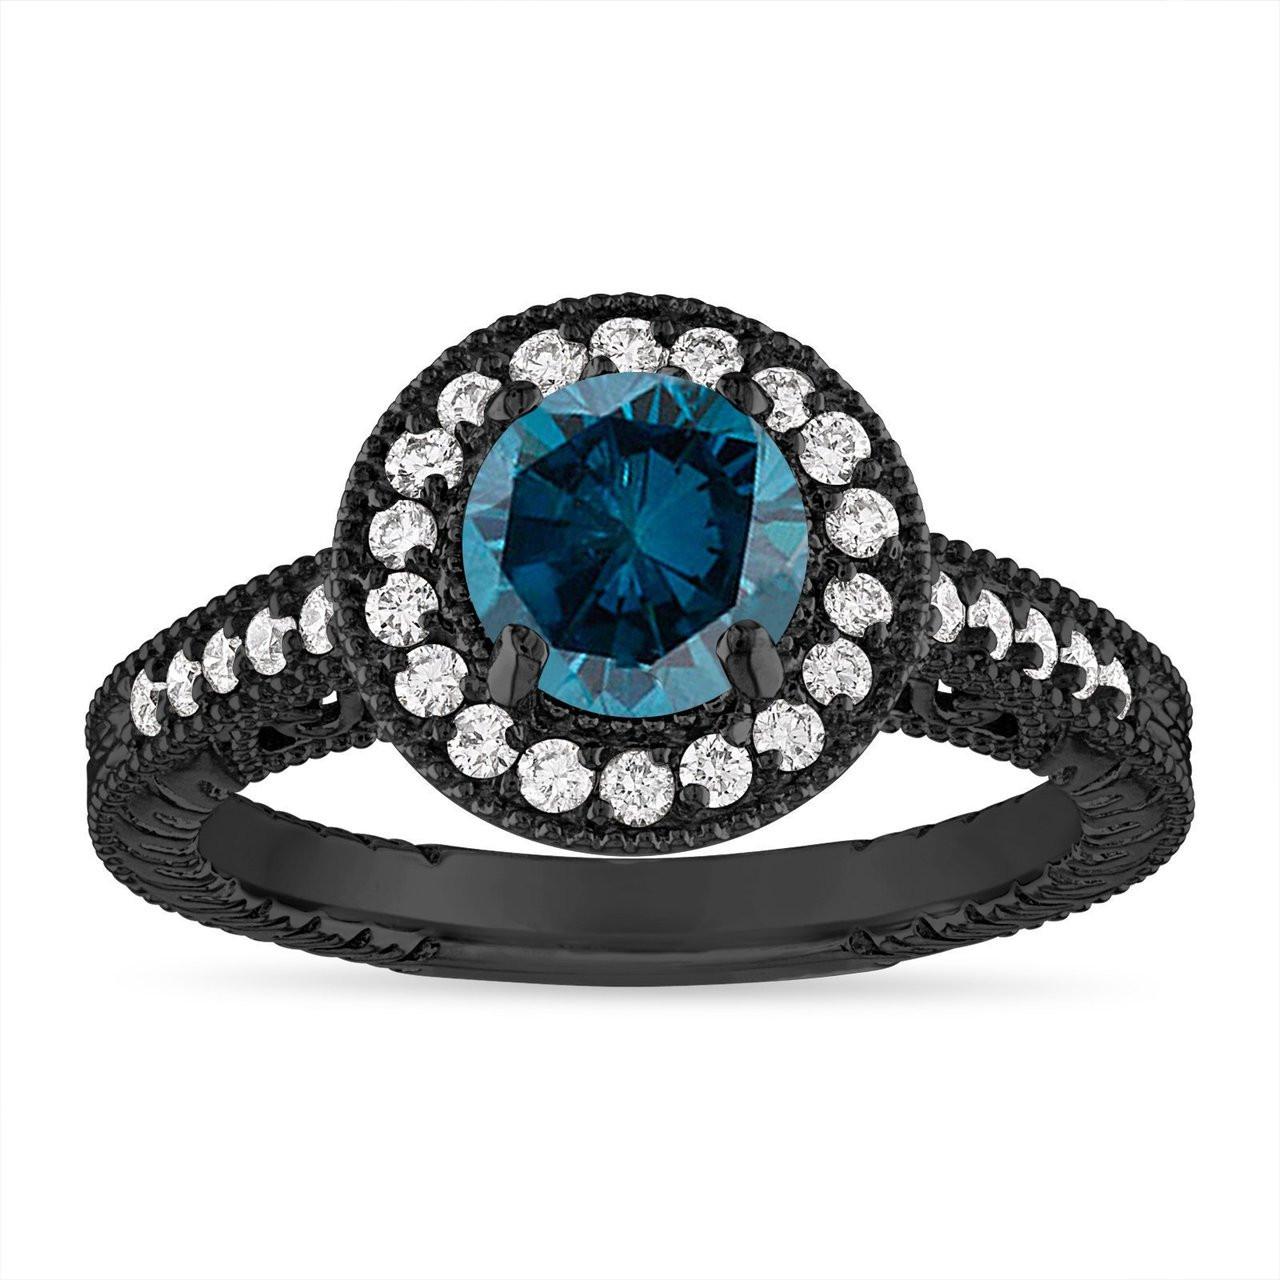 Blue Diamond Engagement Ring Wedding Ring Vintage Halo Pave 14k Black Gold 1 29 Carat Certified Handmade Unique